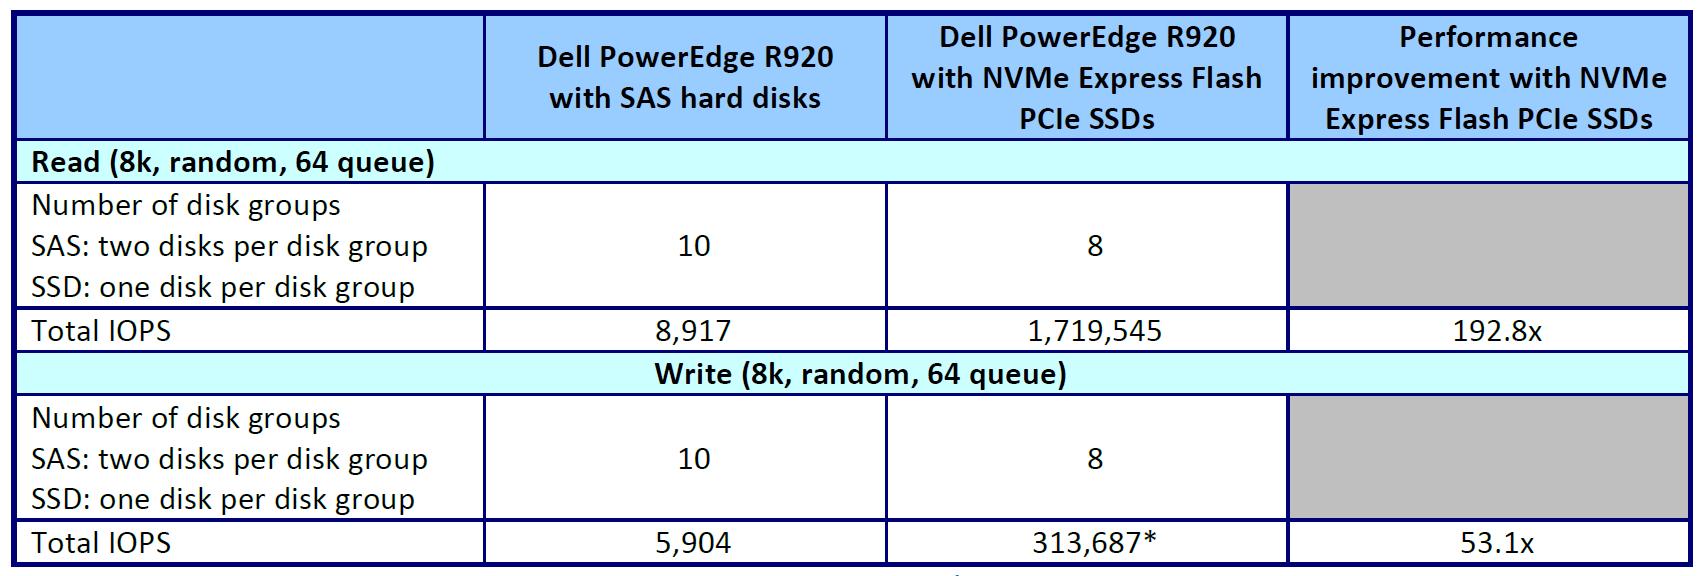 Преимущество новой конфигурации DELL PE R920 c SSDs на NVME EXPRESS FLASH PCIE